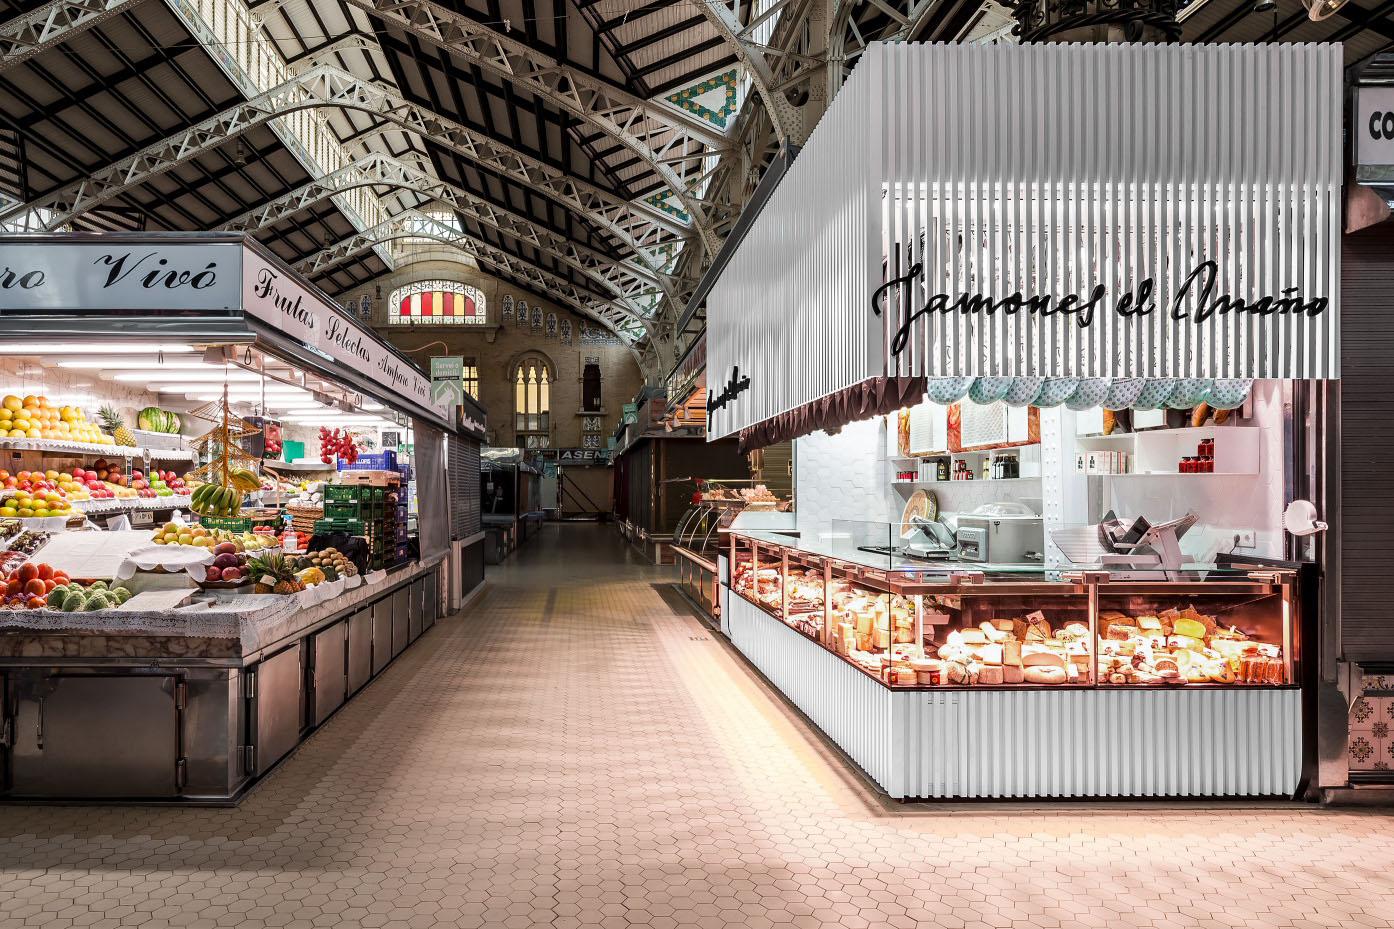 fotografia-arquitectura-valencia-german-cabo-lujan-mercado-central-jamones (X)_portada